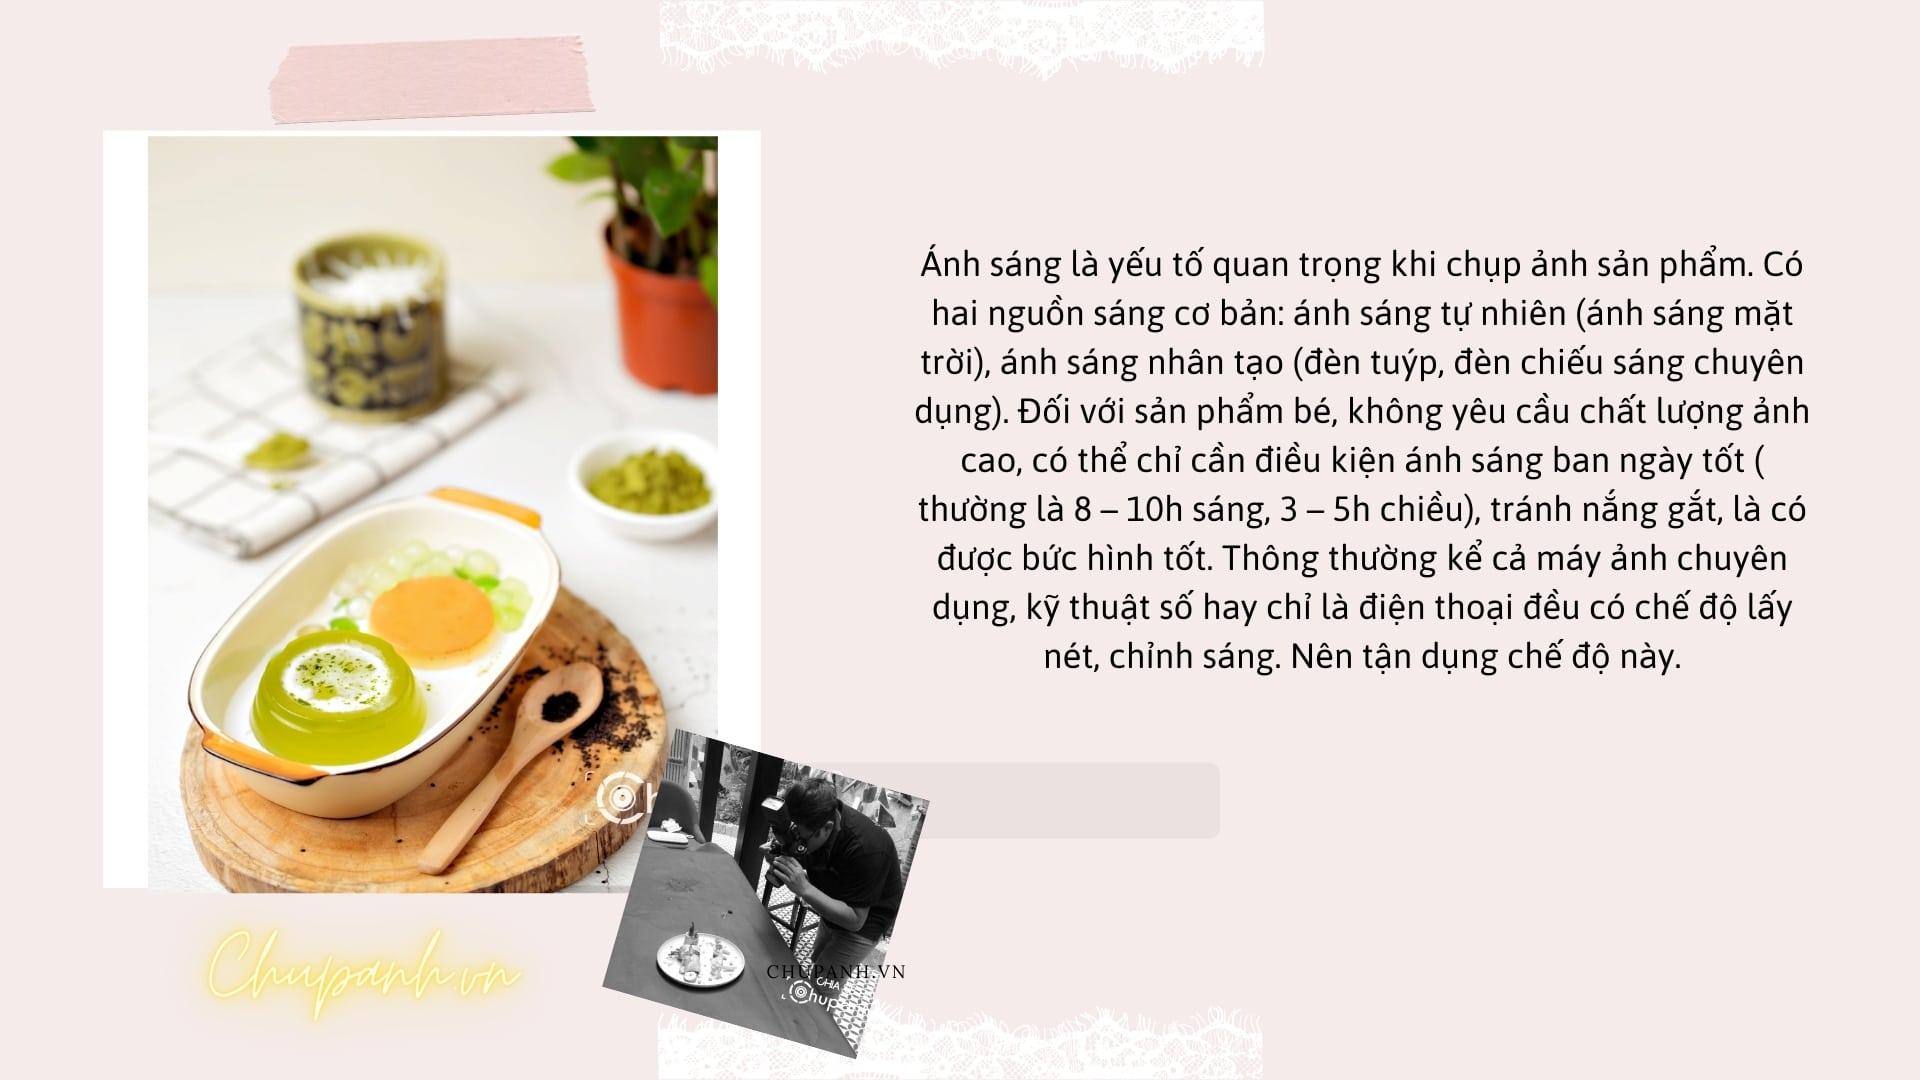 Chup anh san pham theo concept chuyen nghiep 1 1